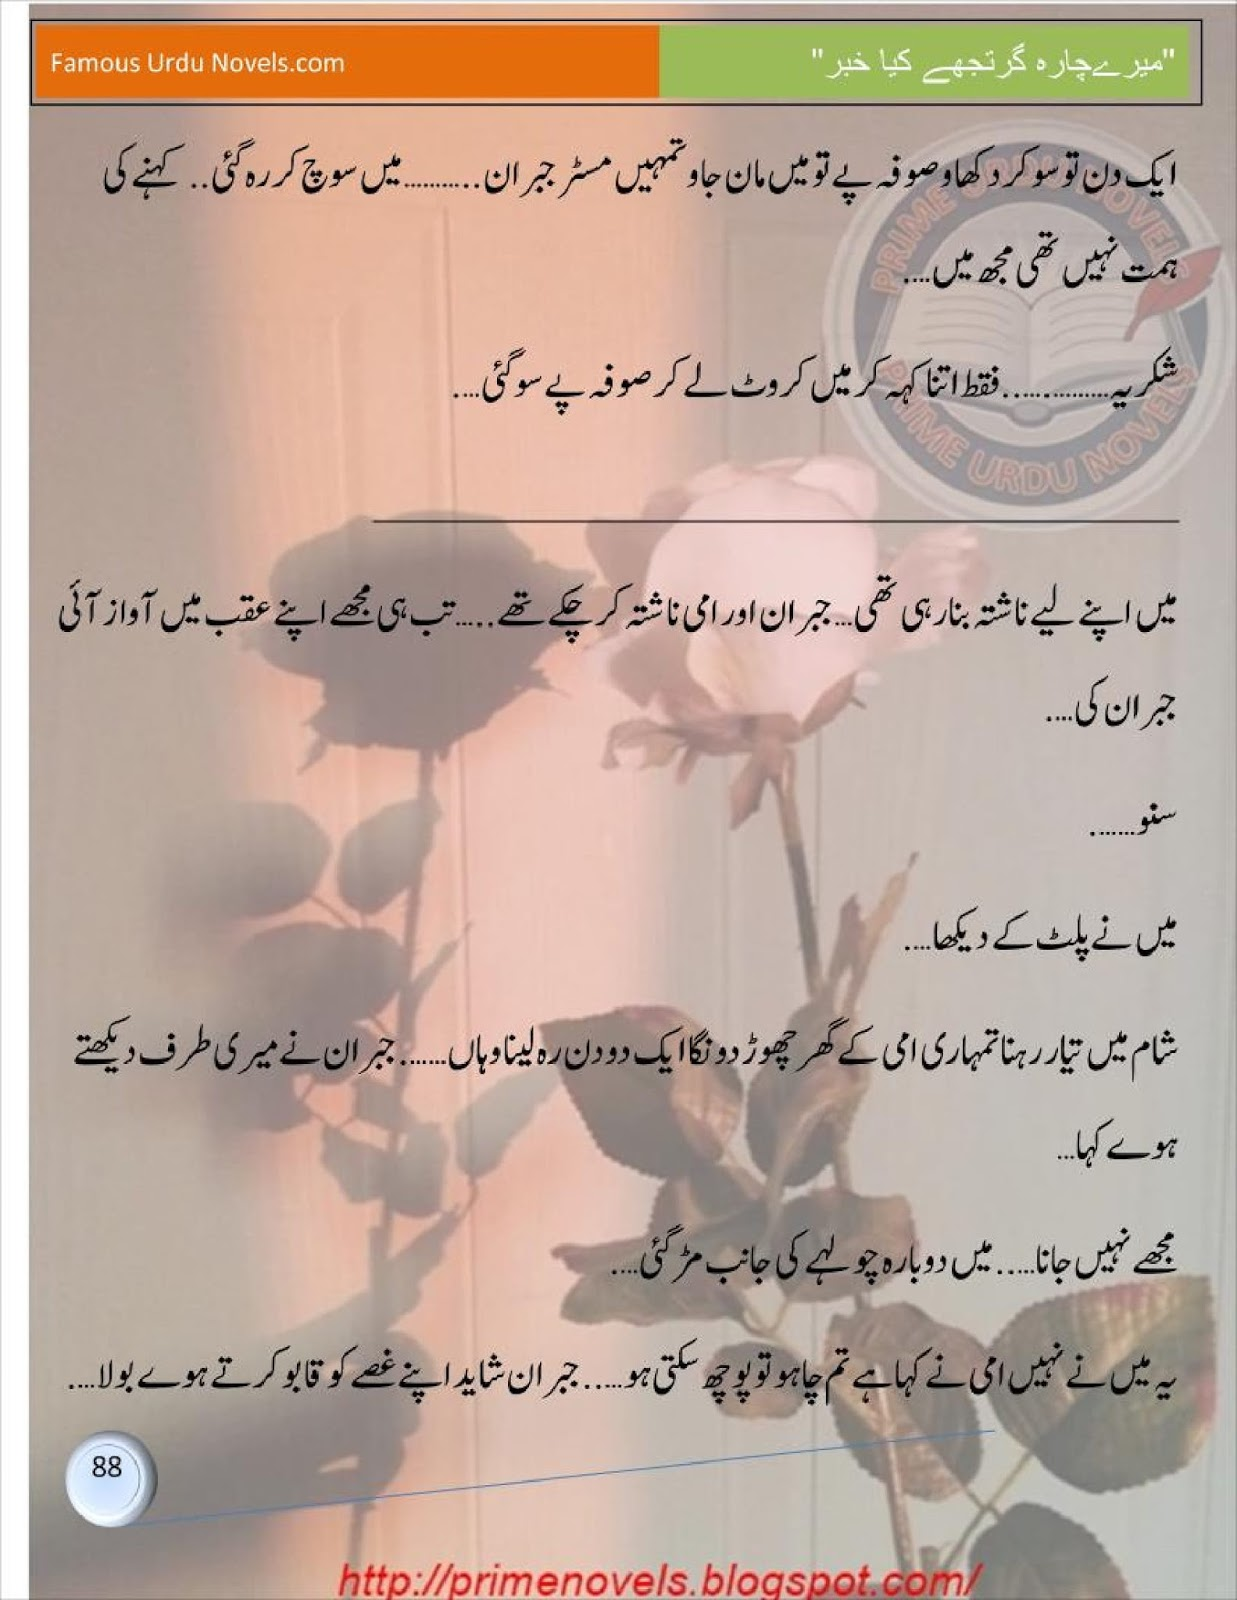 Romantic Urdu Novels List